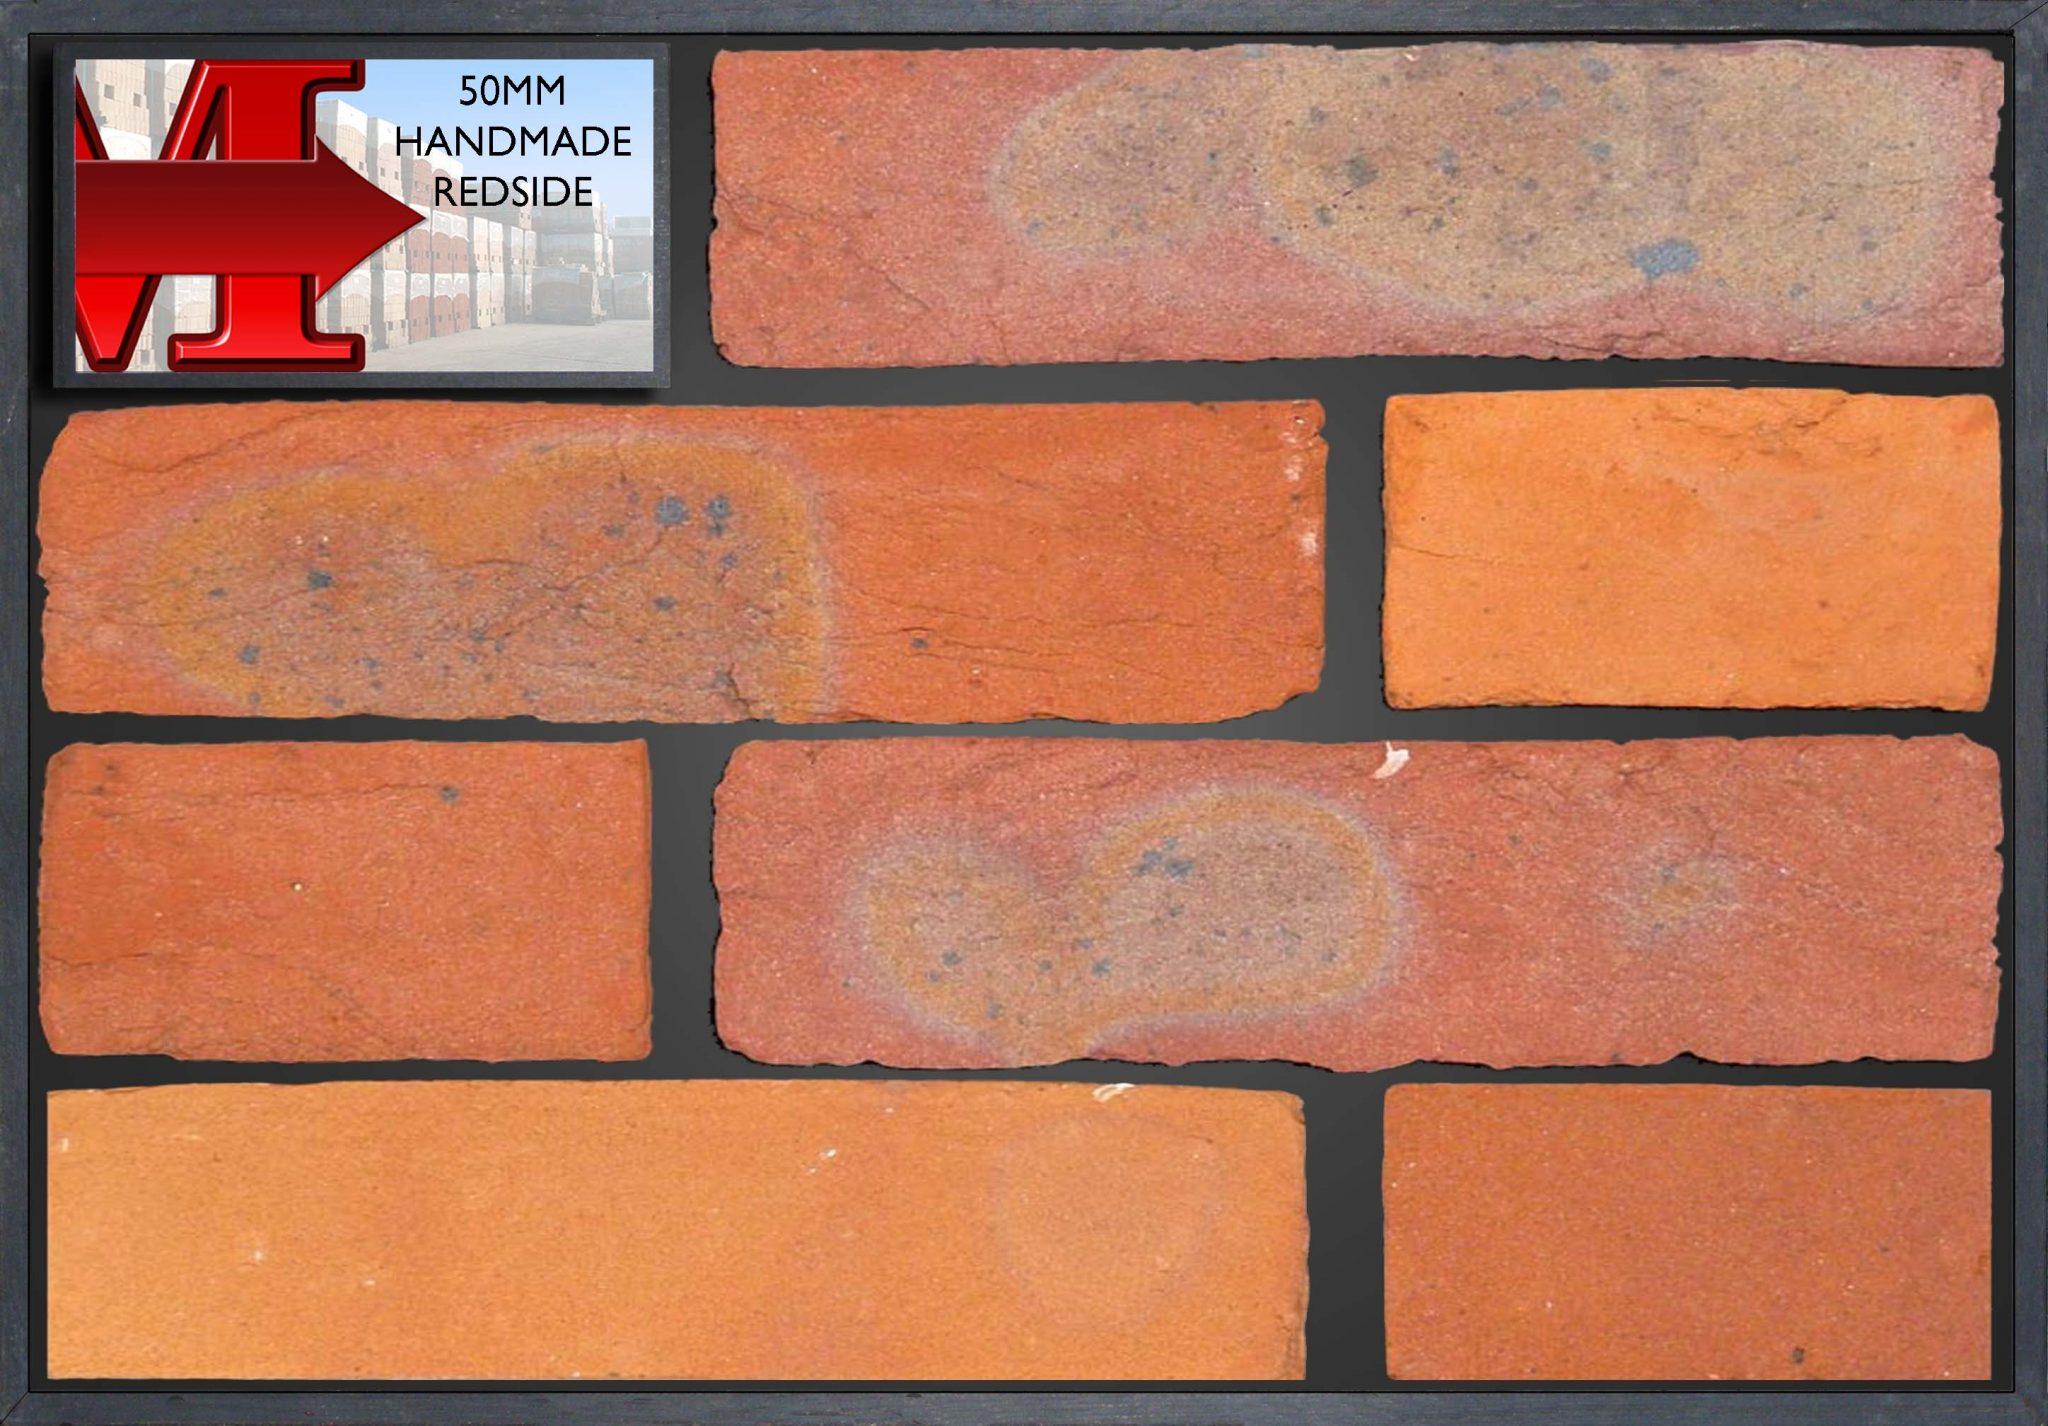 50mm HandMade REDSIDE - Showroom panel